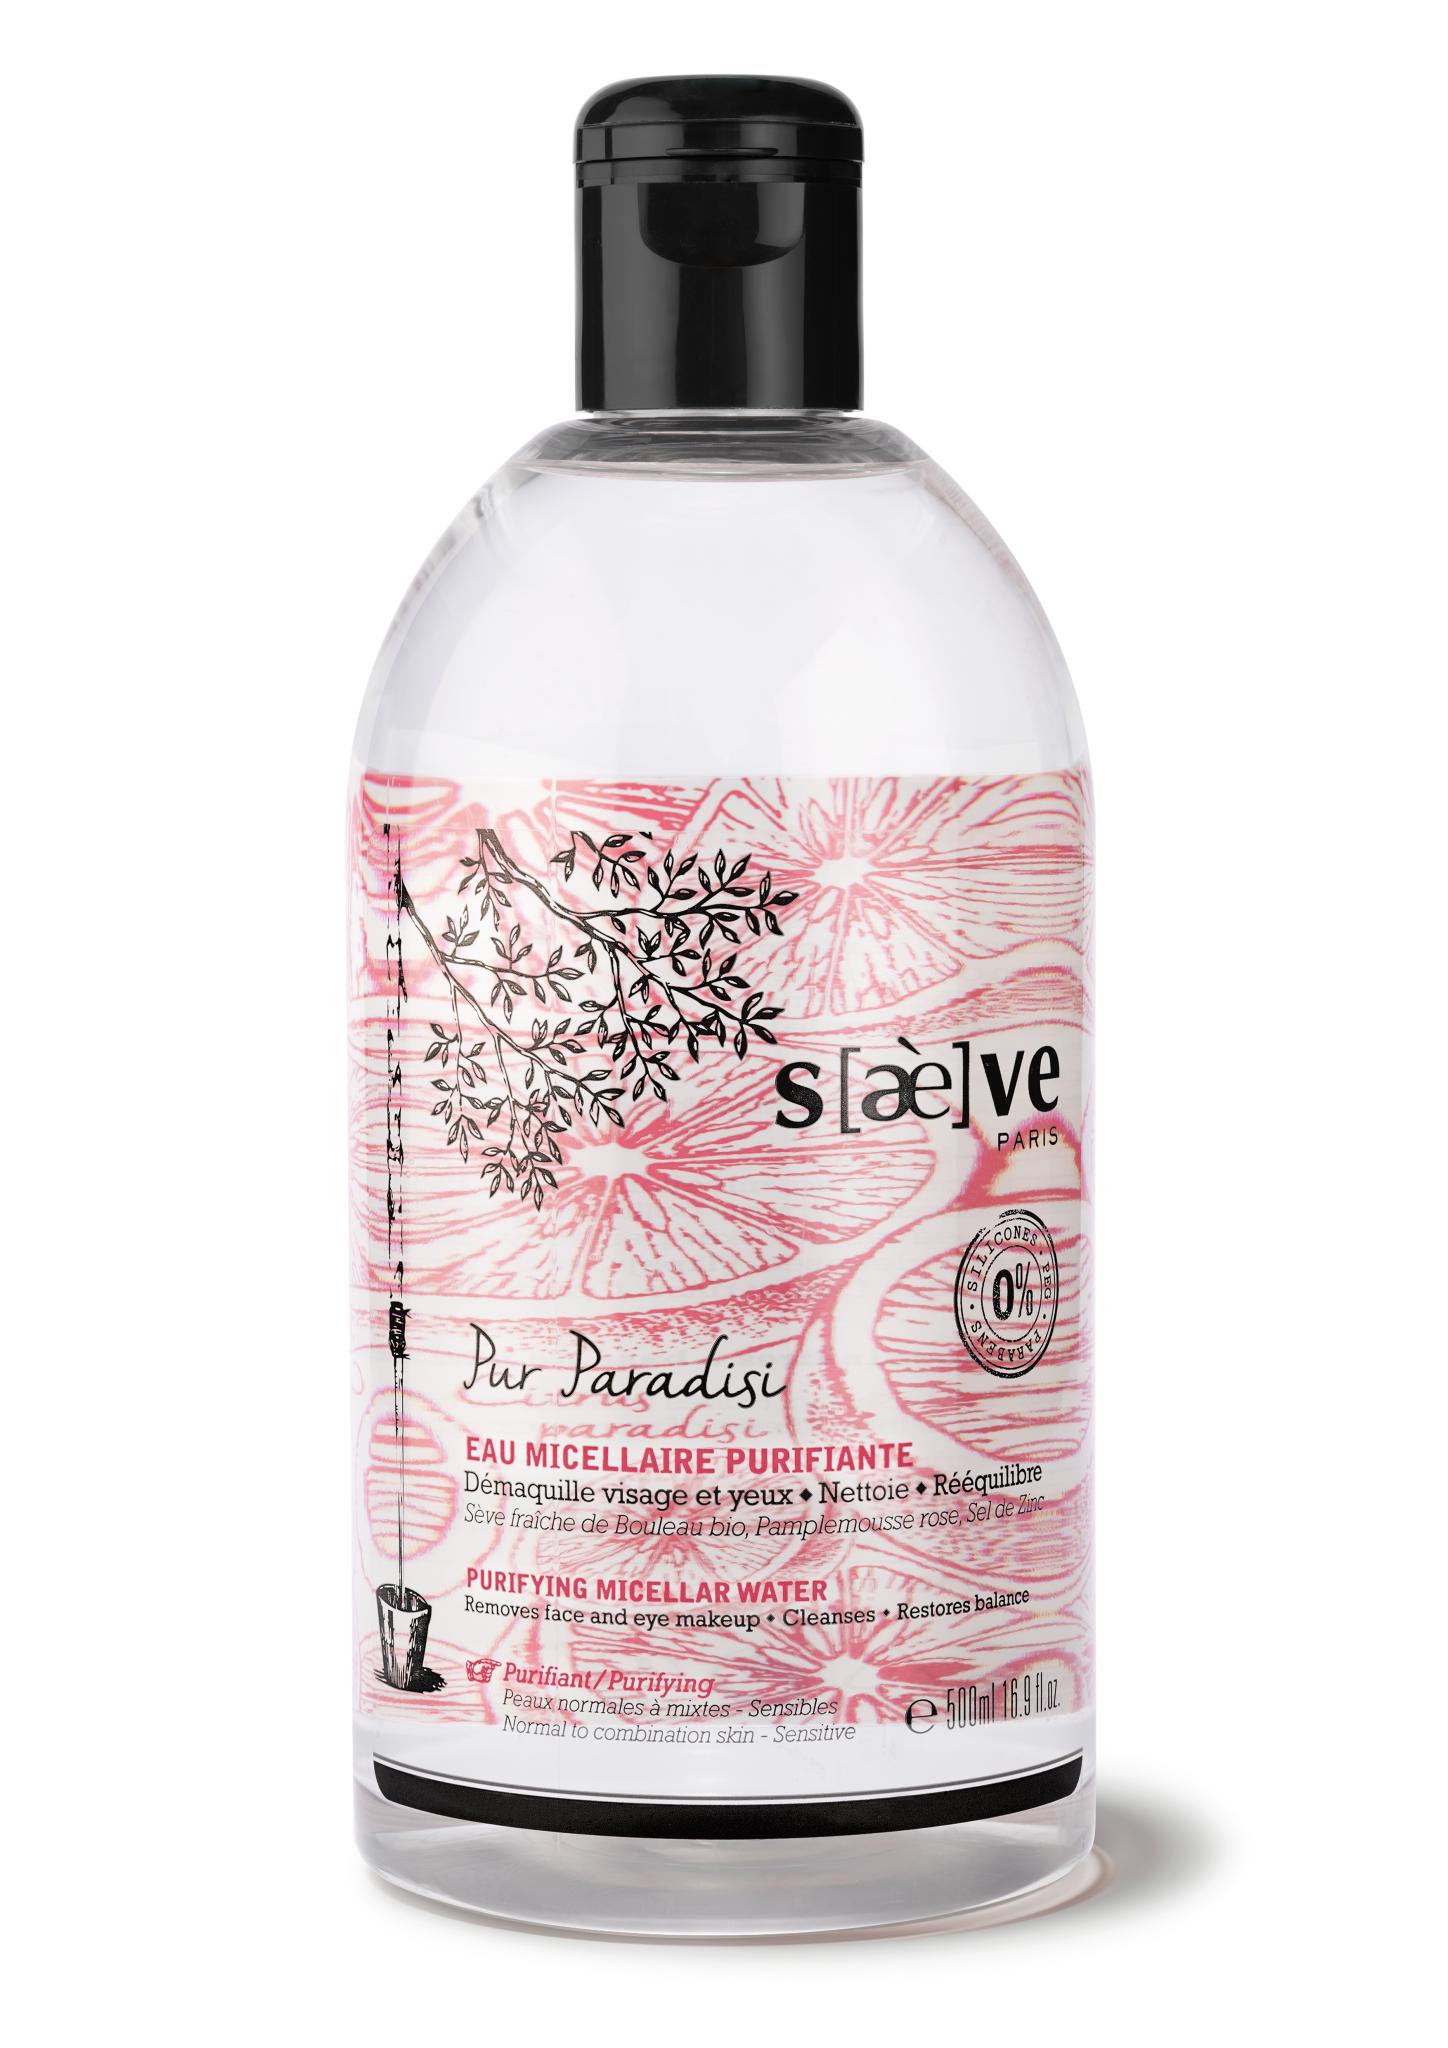 Saeve pur paradisi eau micellaire 500 ml